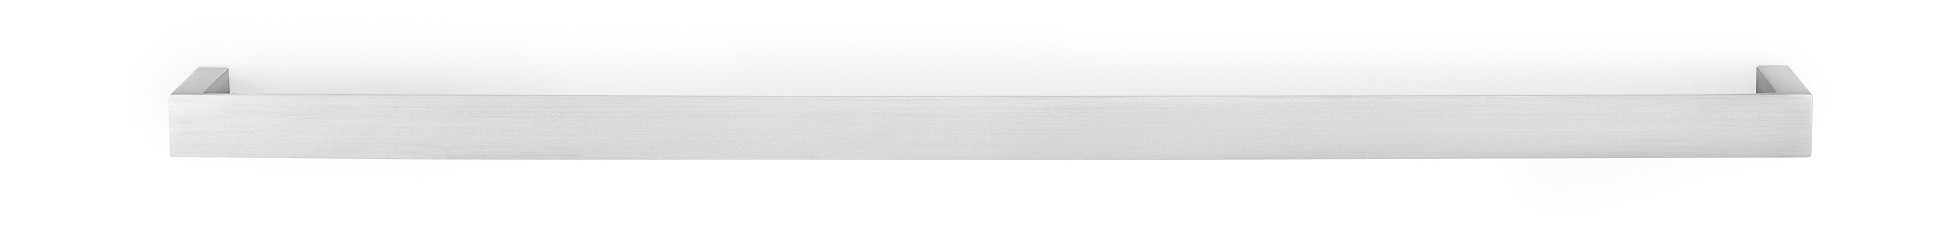 60 cm ZACK 20990 Elios Kitchen Rail includes Fixing Set